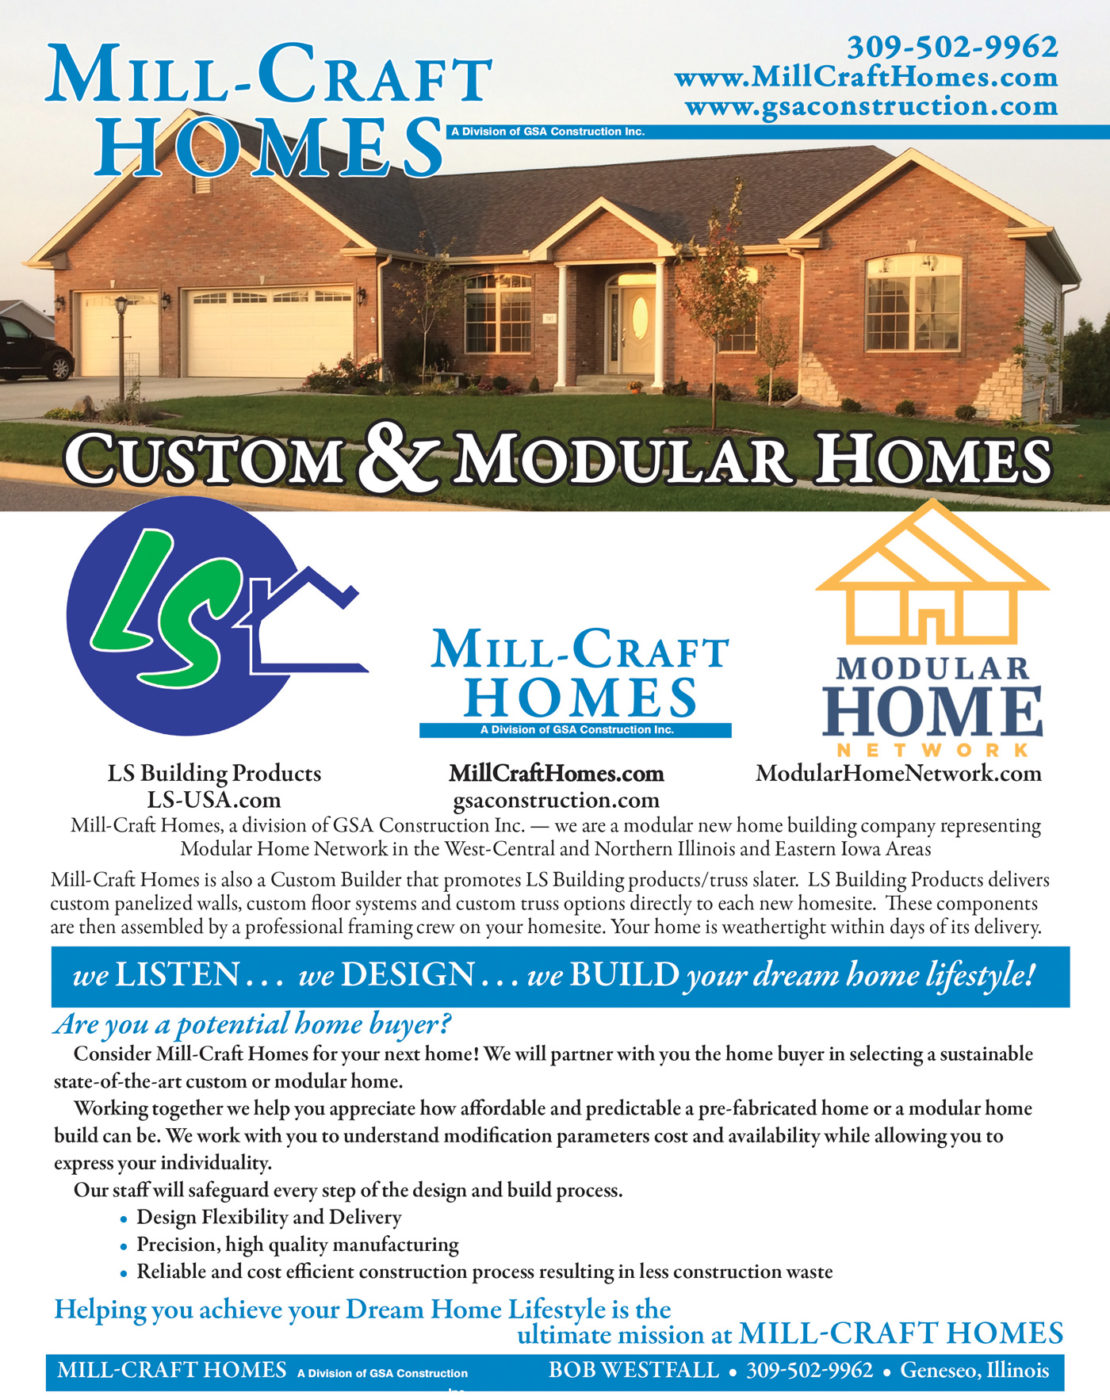 Mill-Craft Homes Brochure -